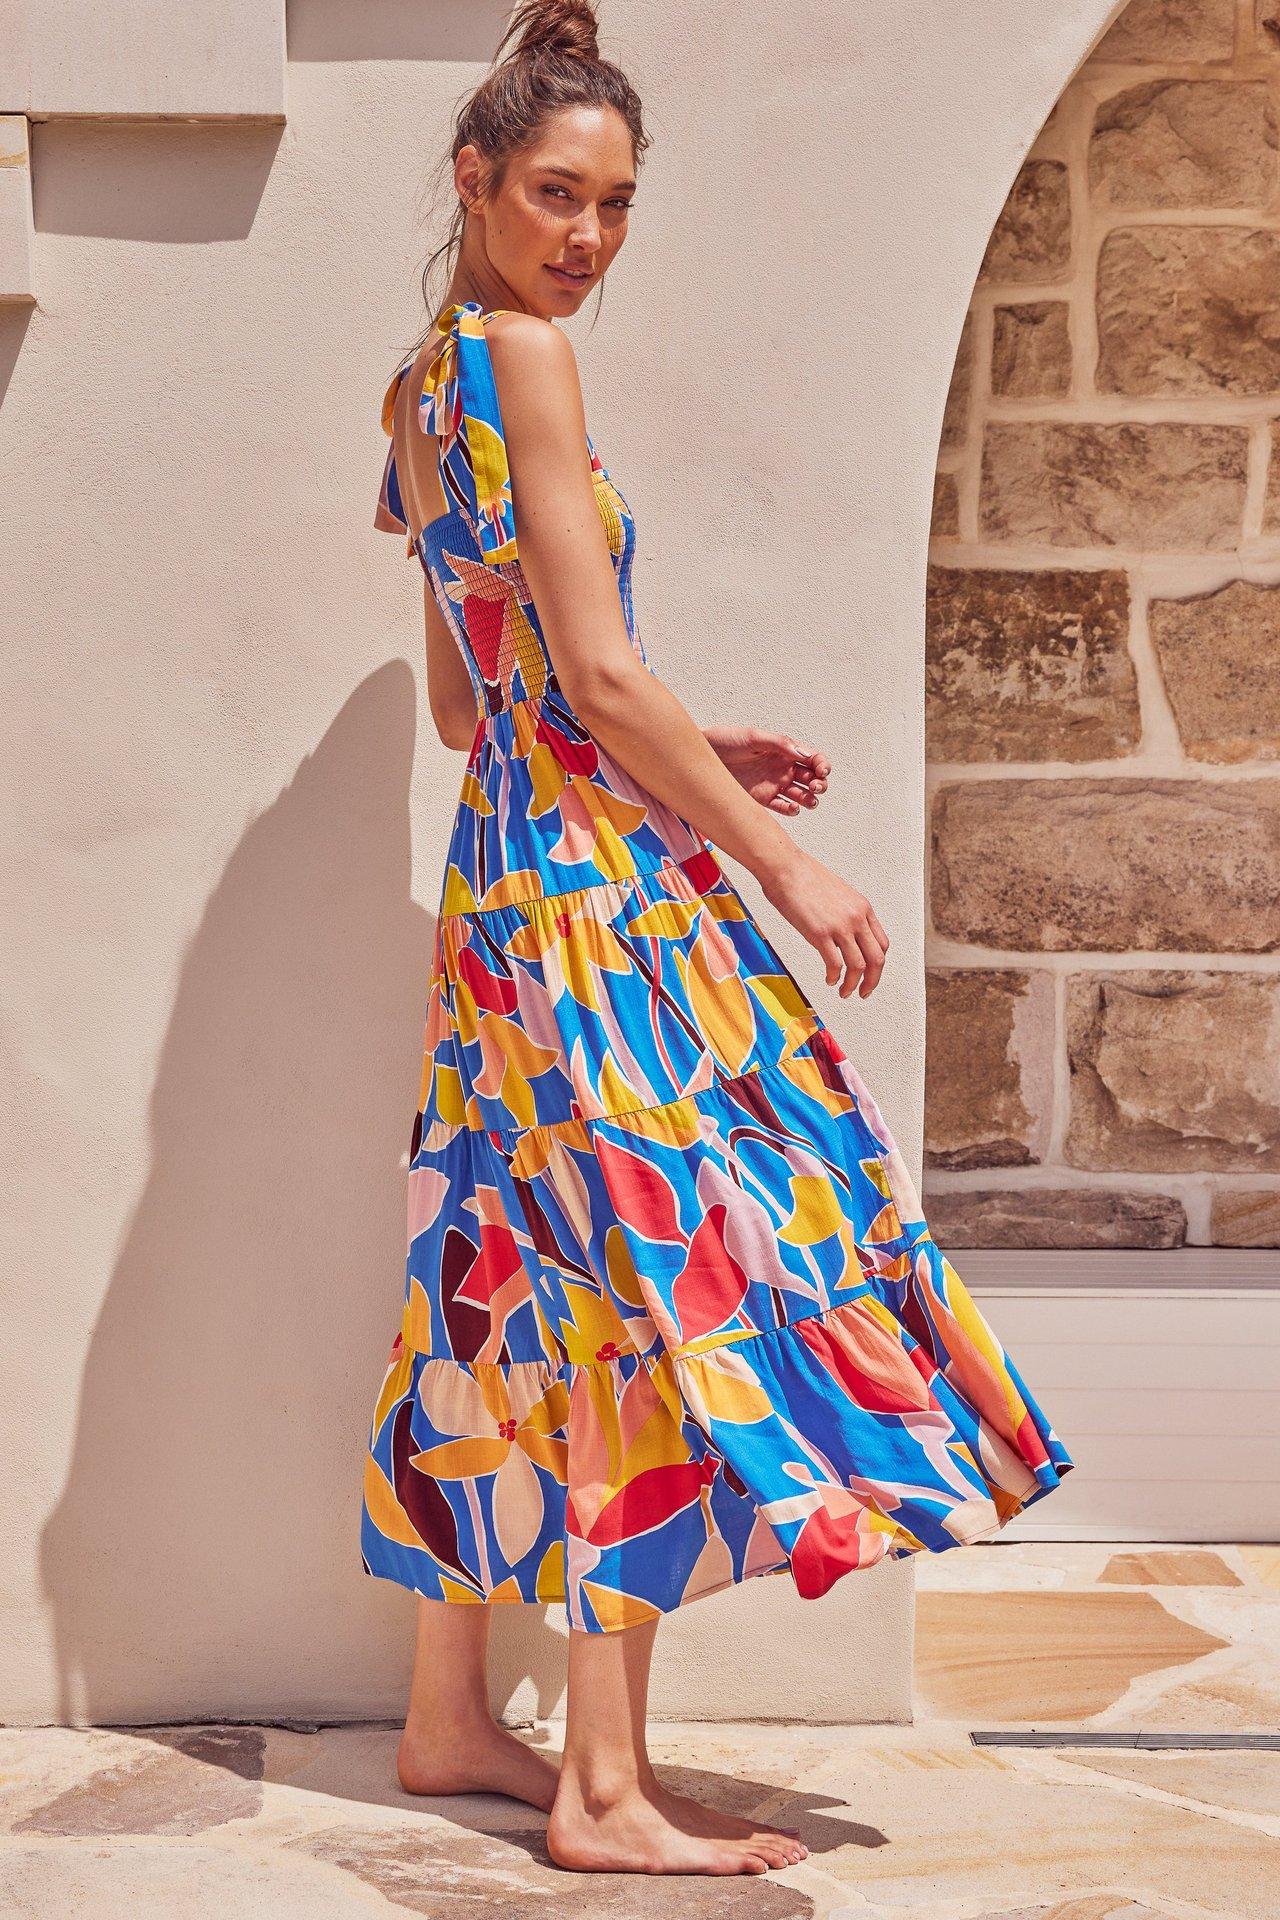 Fashion Summer Women Dress Square Neck Sling Print Sexy Halter Beach Dress Women's Casual Holiday Dresses 2021 New Vestidos 7